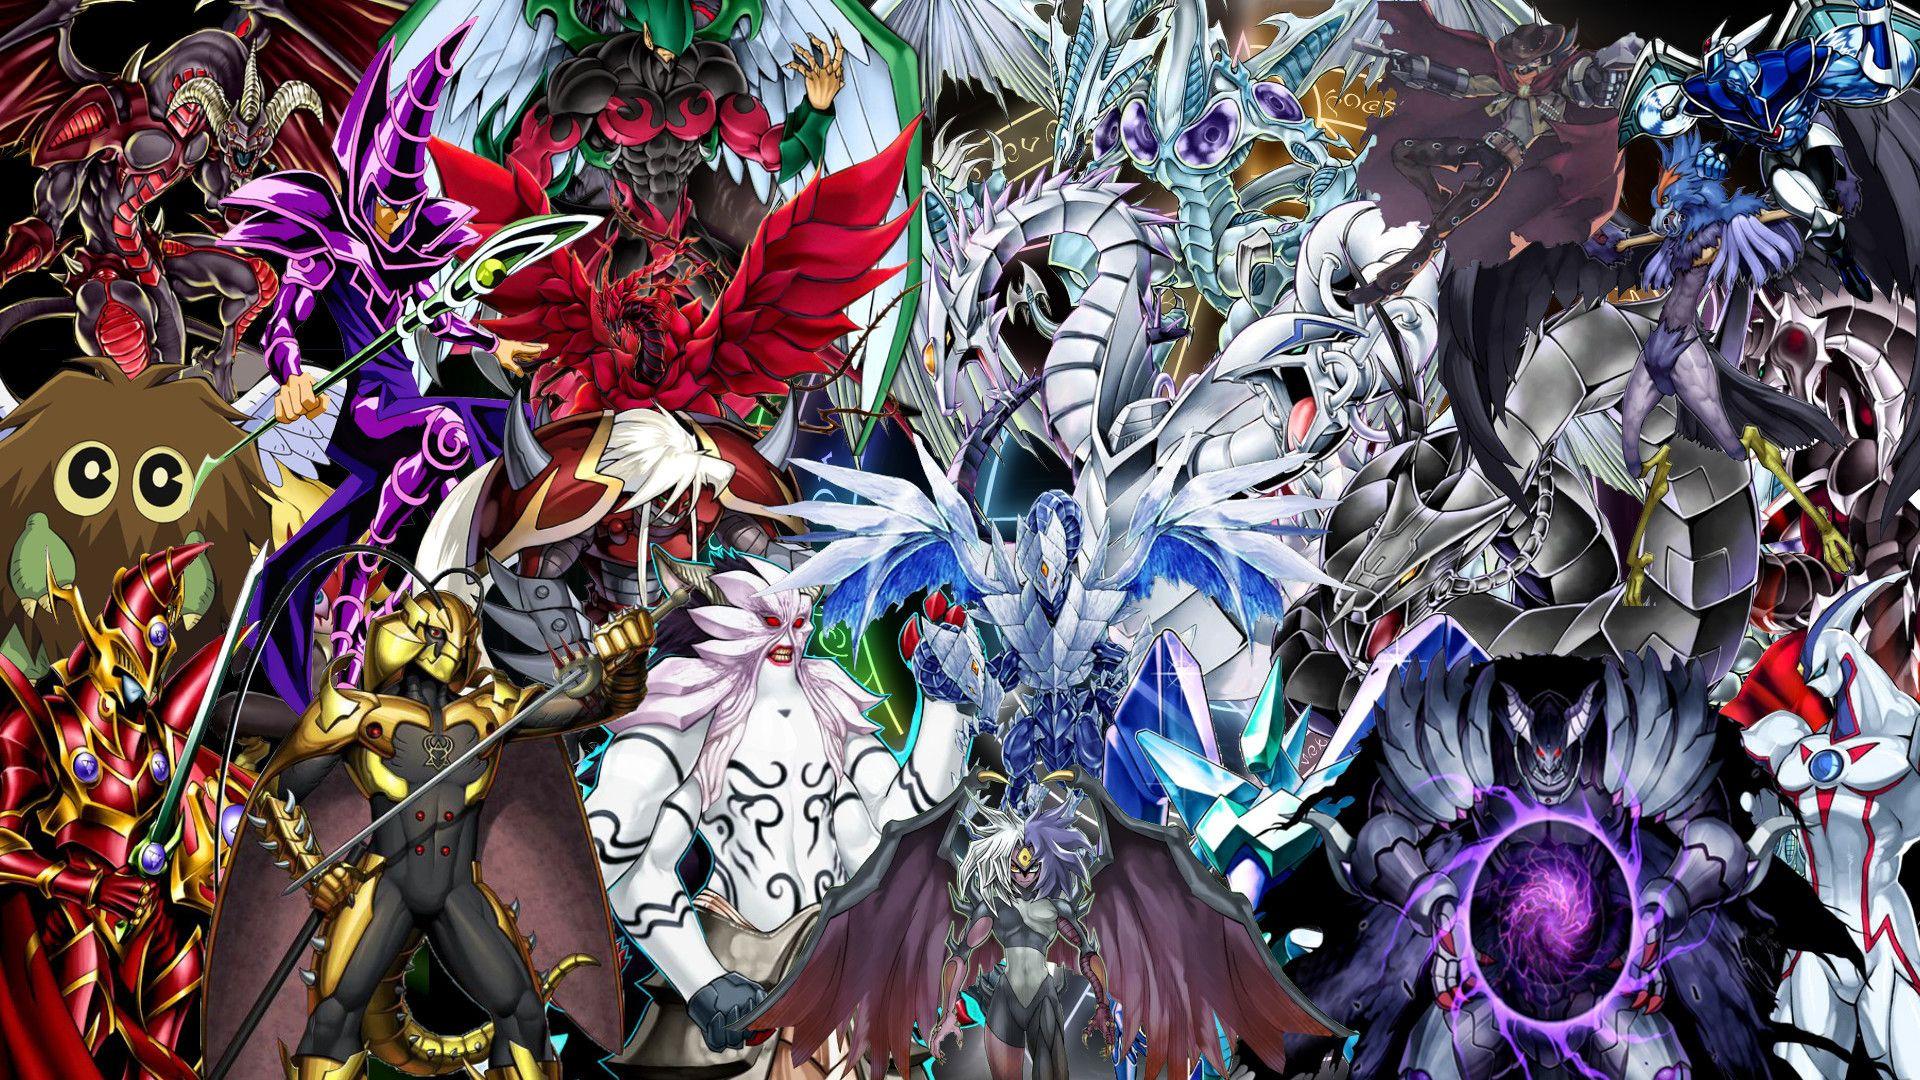 Yu Gi Oh Wallpapers   Top Yu Gi Oh Backgrounds